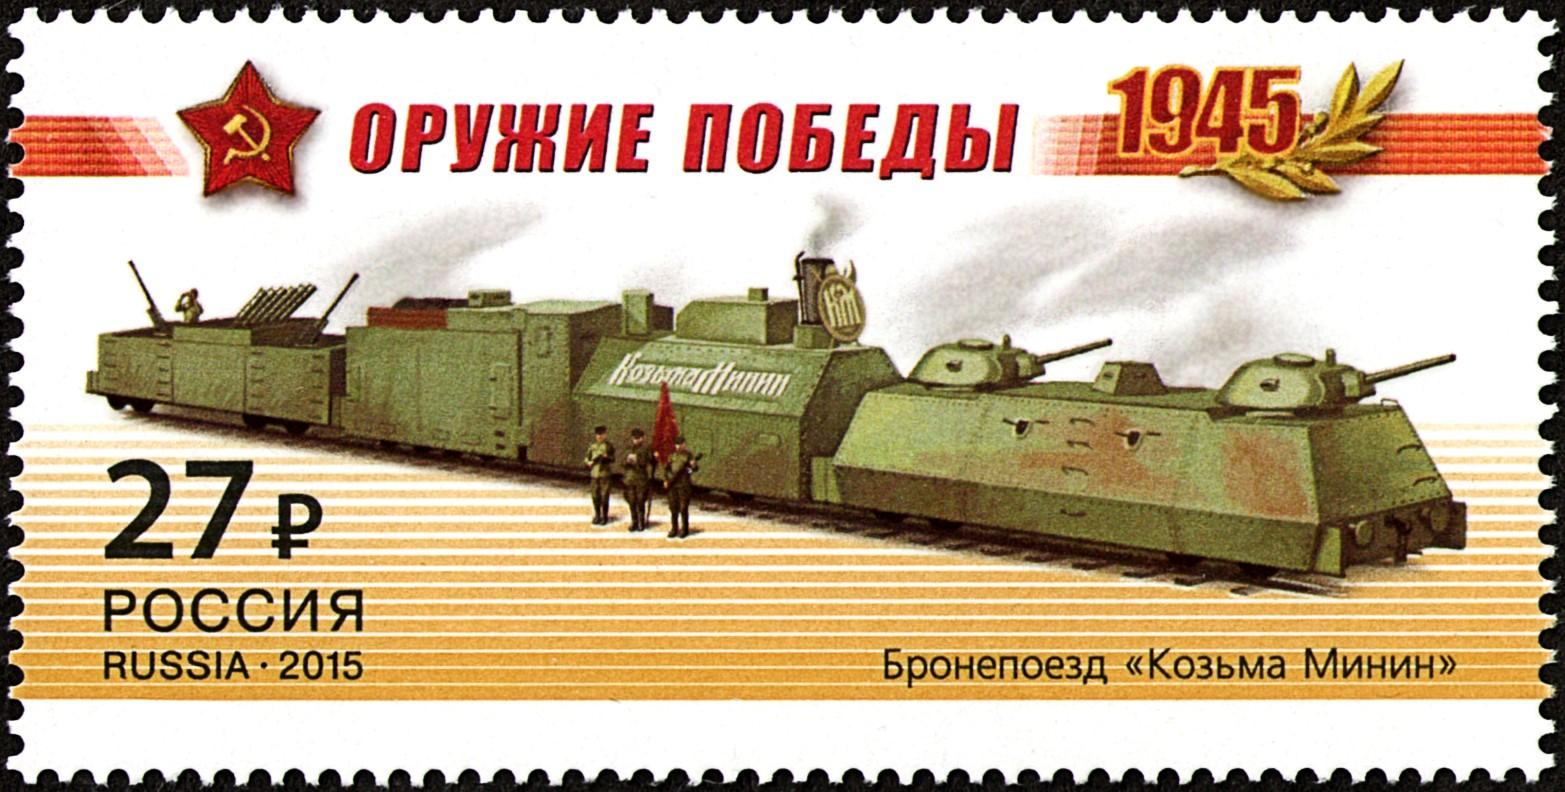 Armored Train Kozma Minin